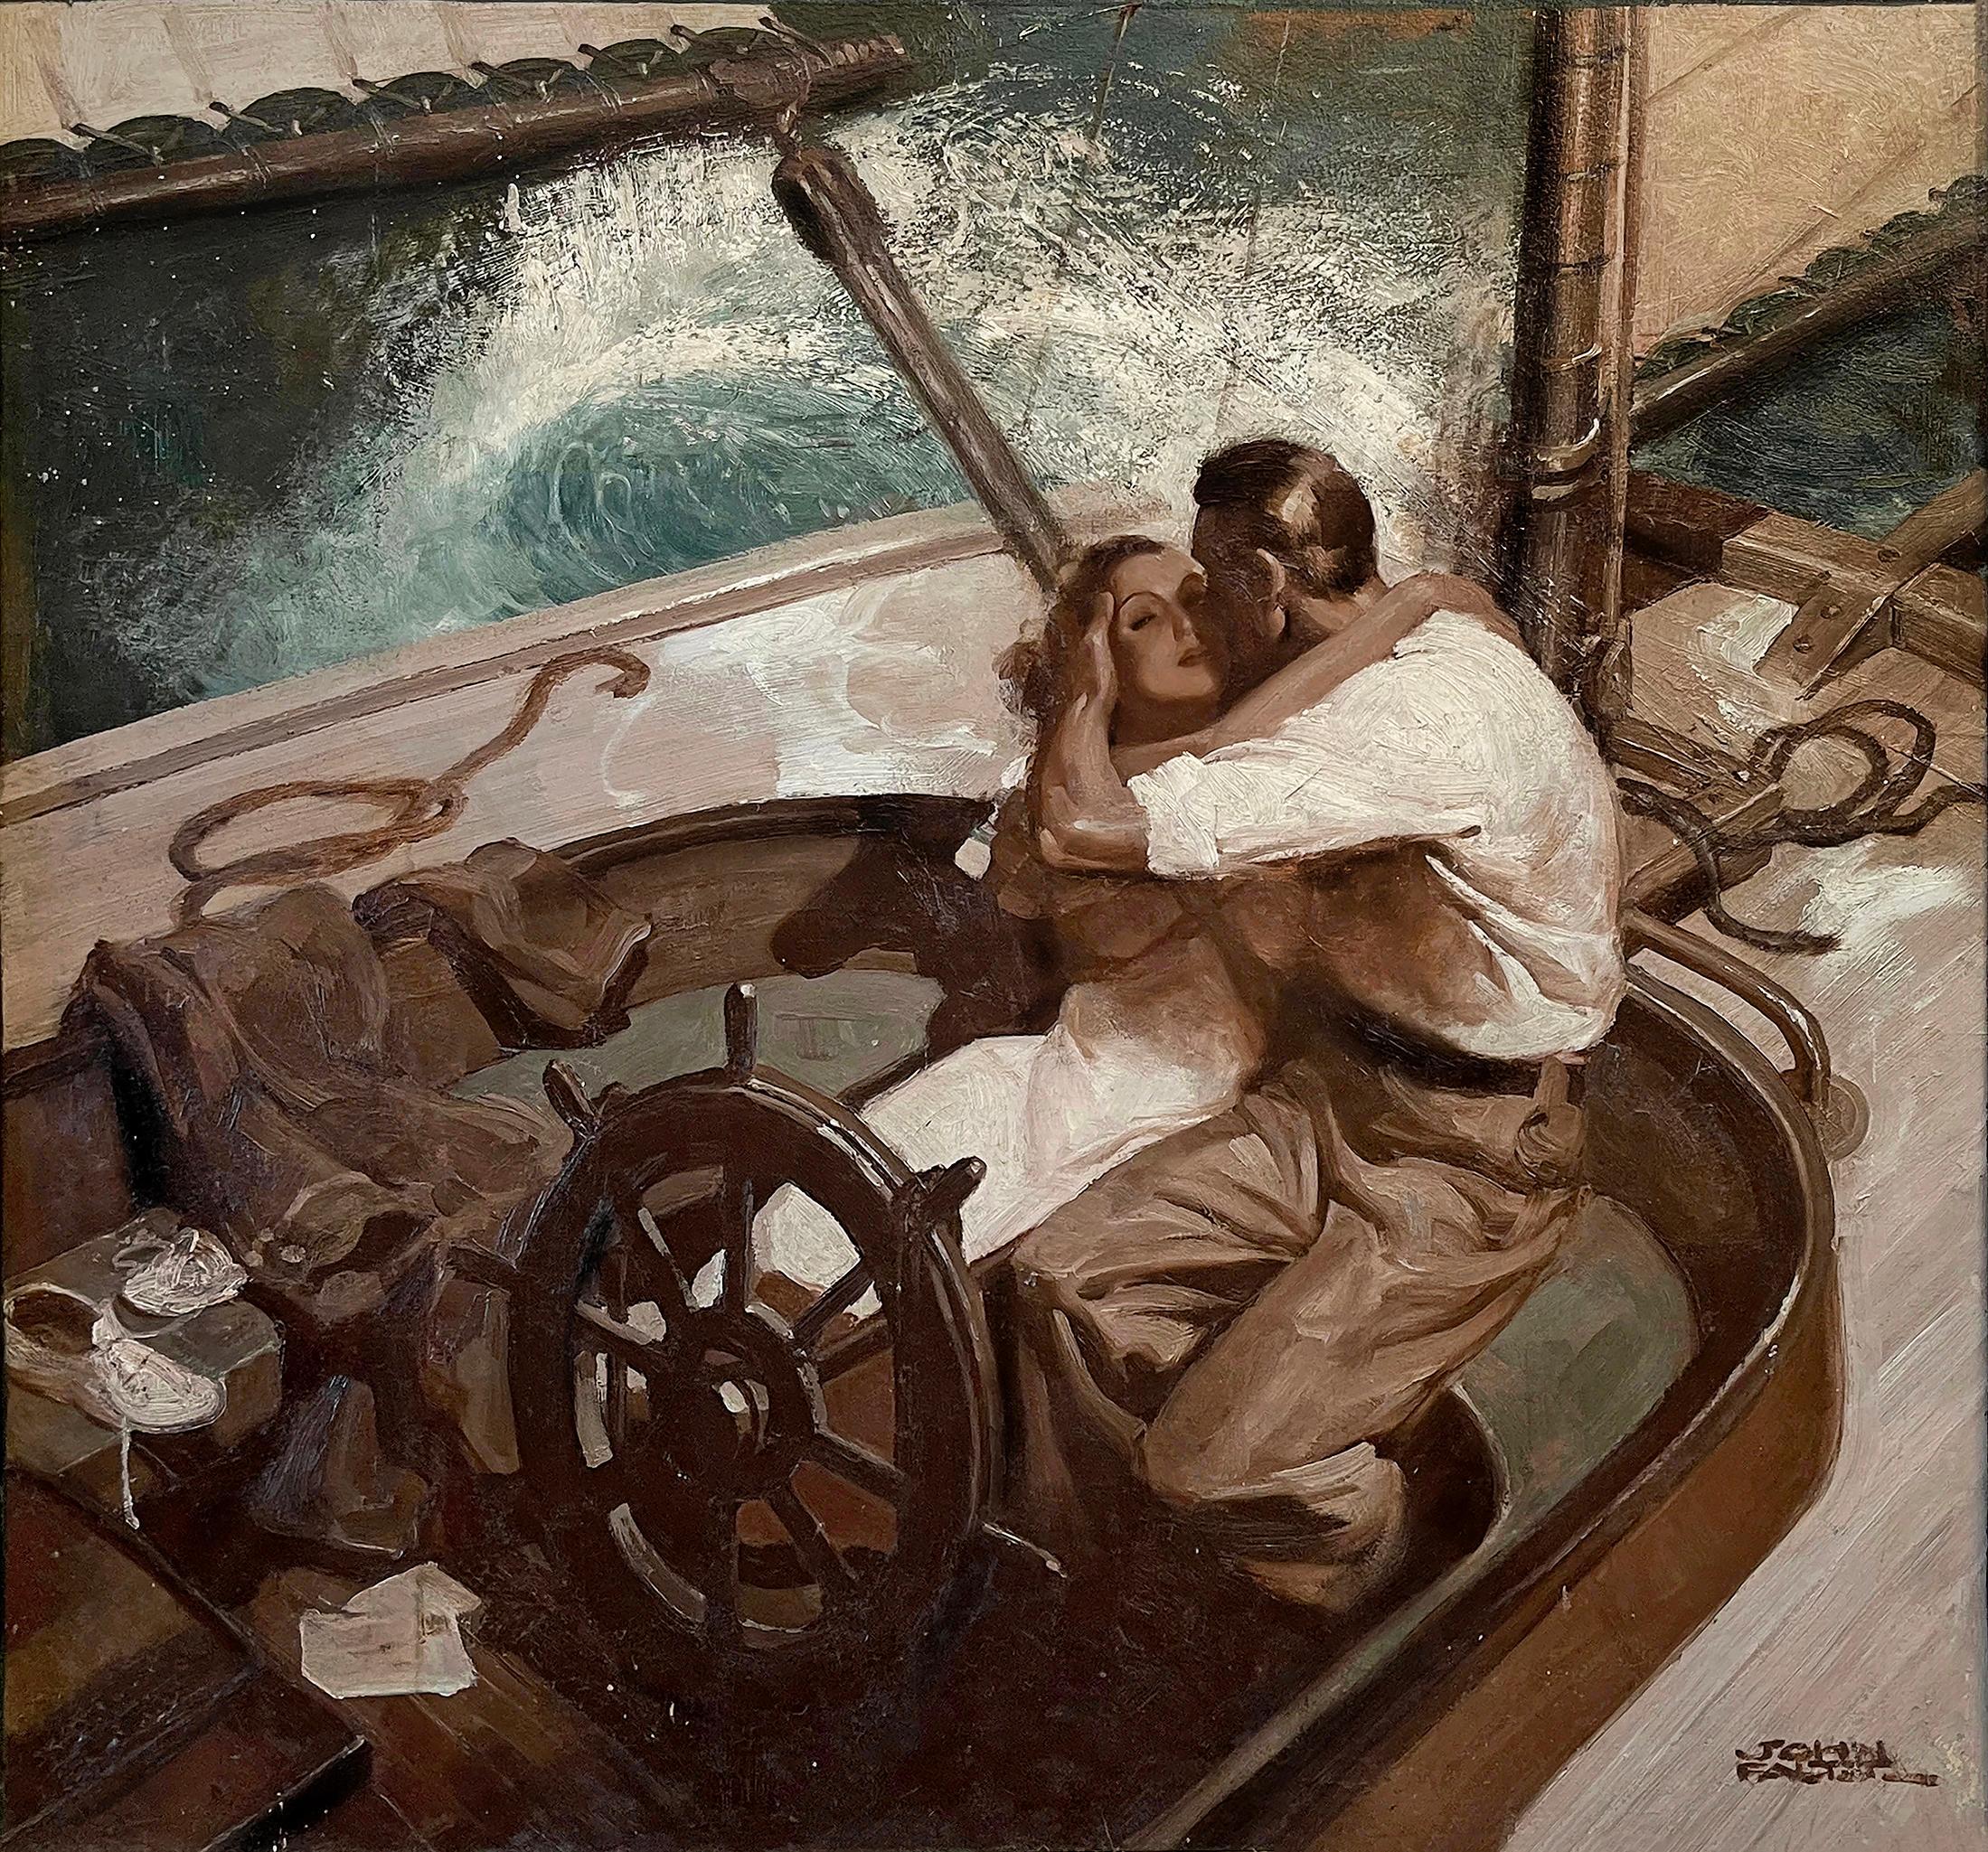 Embracing Couple on Sailboat , Art Deco Style Romantic